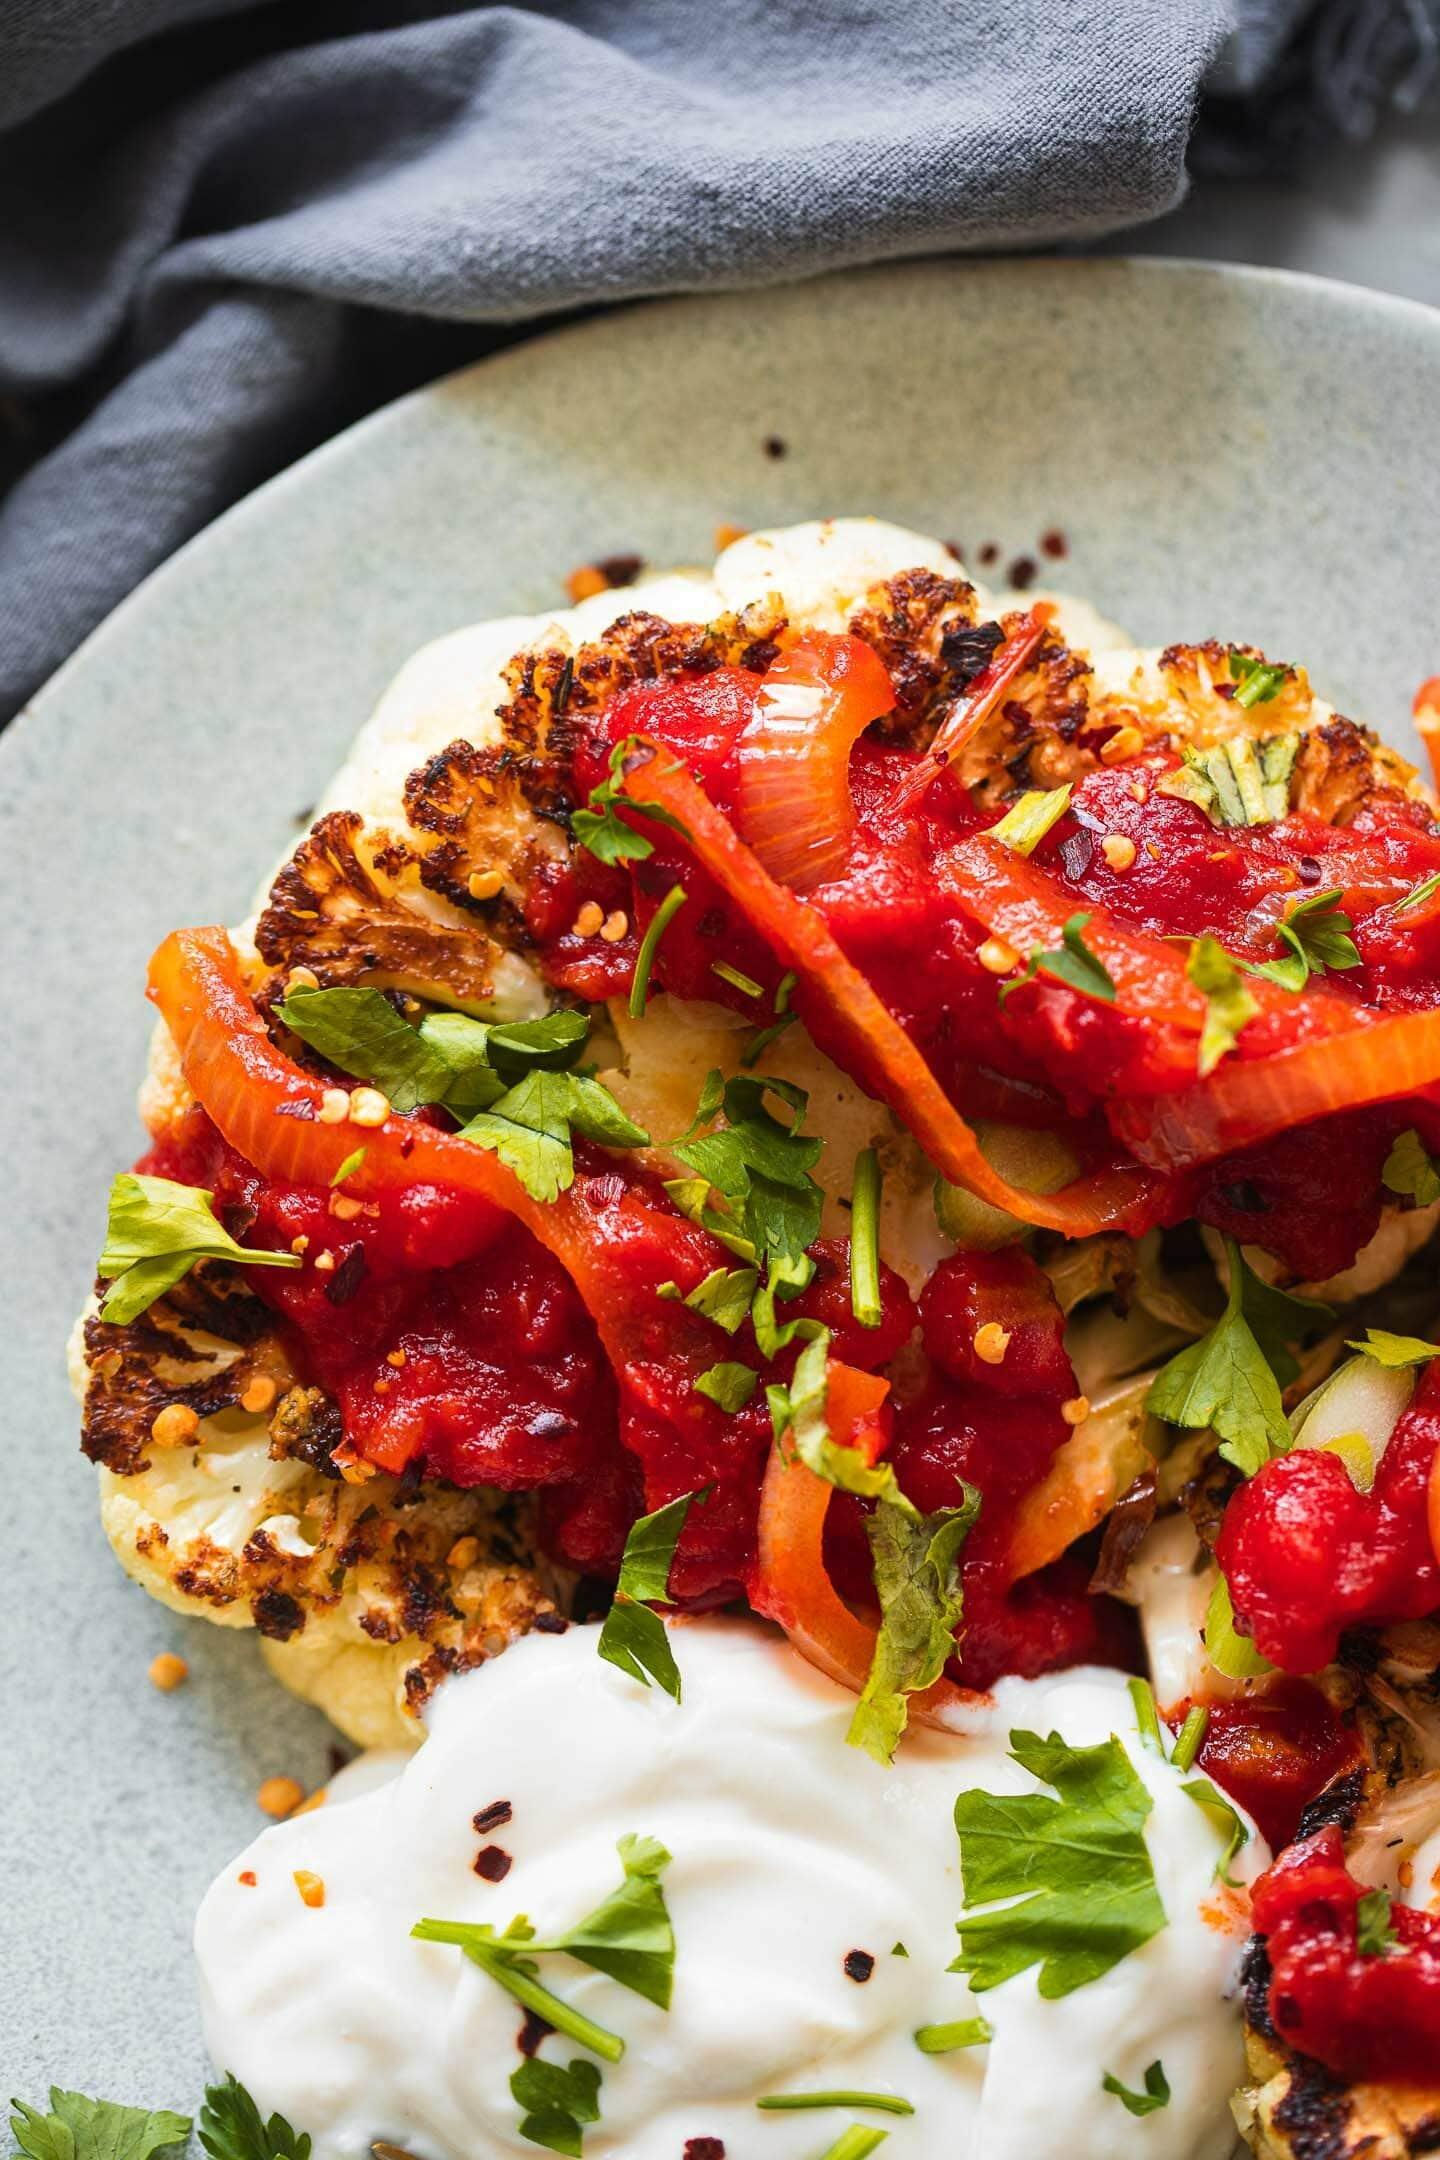 Vegan cauliflower steak with tomato sauce and soy yoghurt